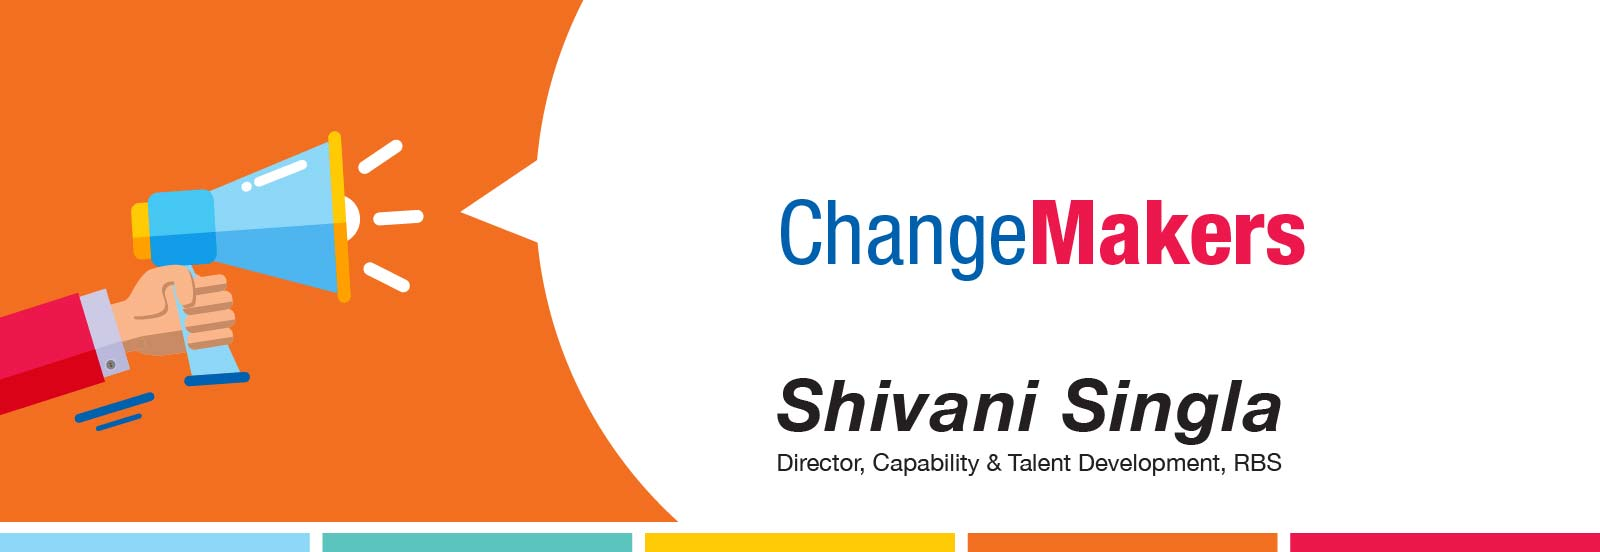 Shivani Singla